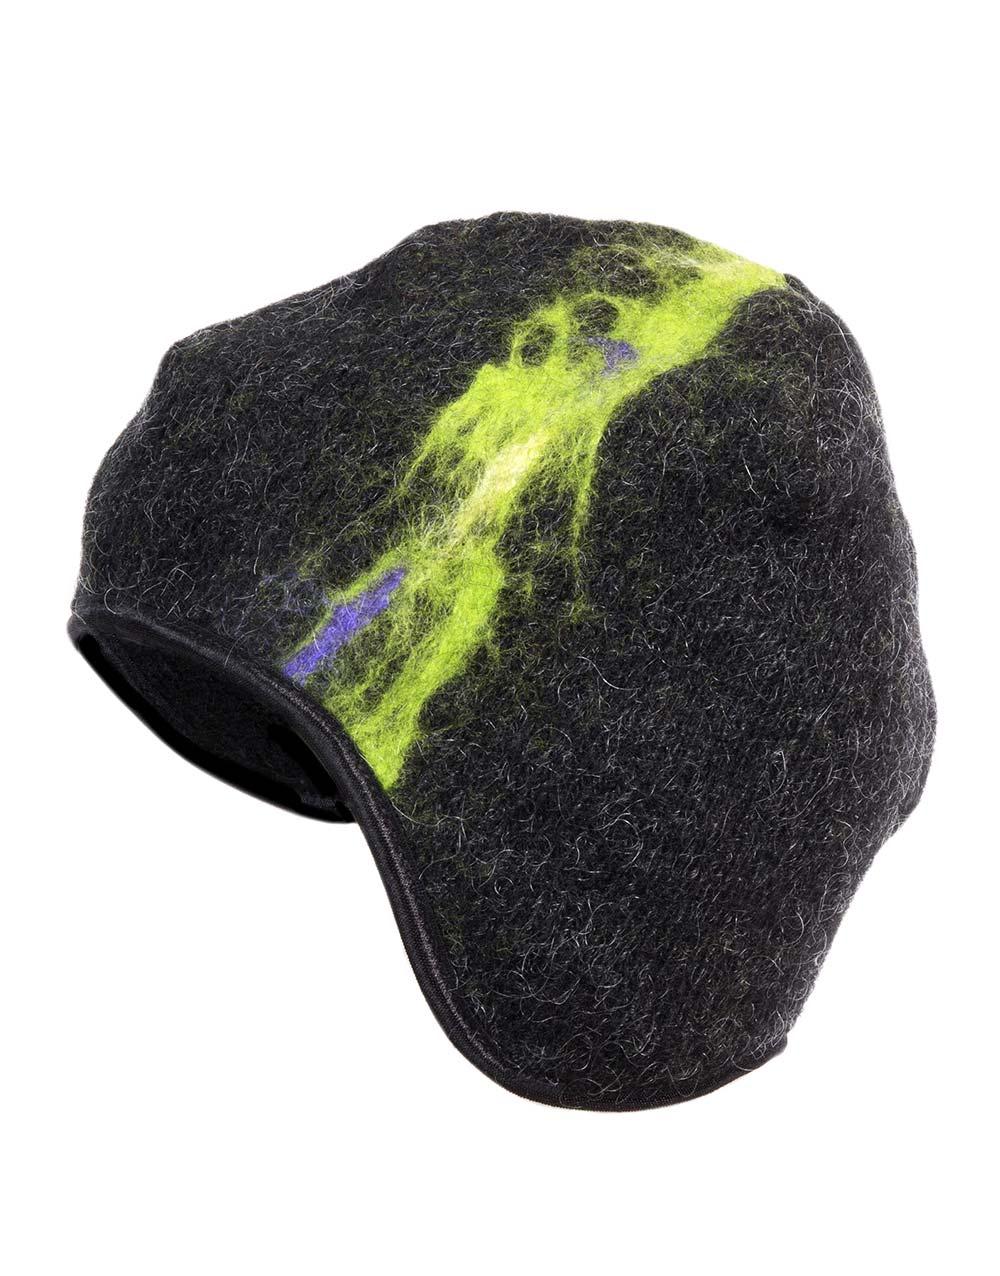 aurora cap earflaps, gjoska.is